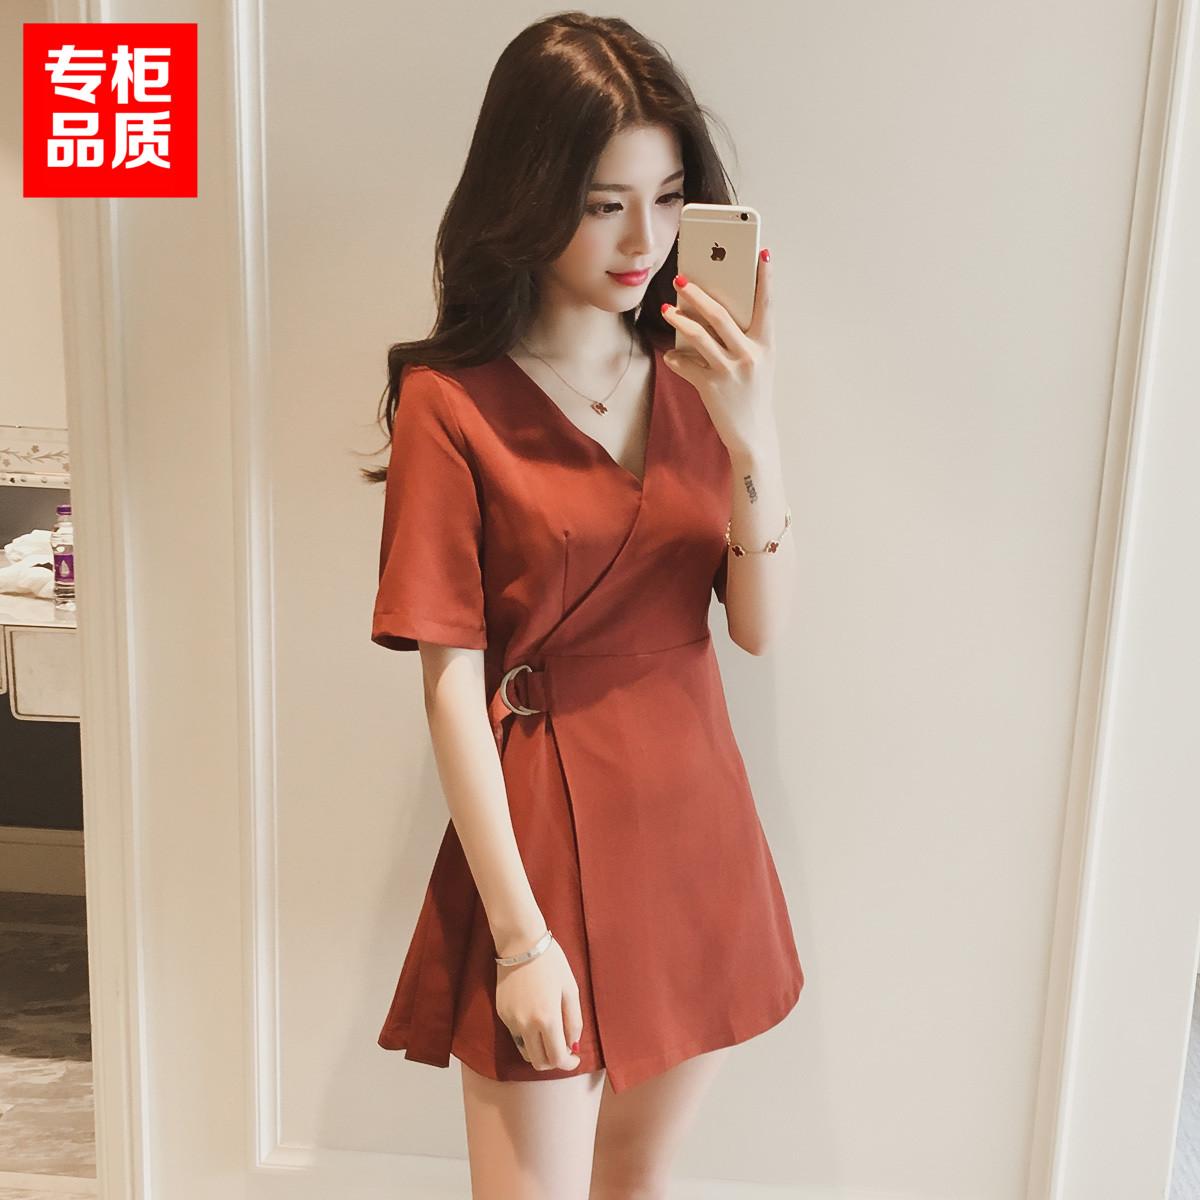 150cm矮个子夏季小码xs韩版连衣裙35.00元包邮